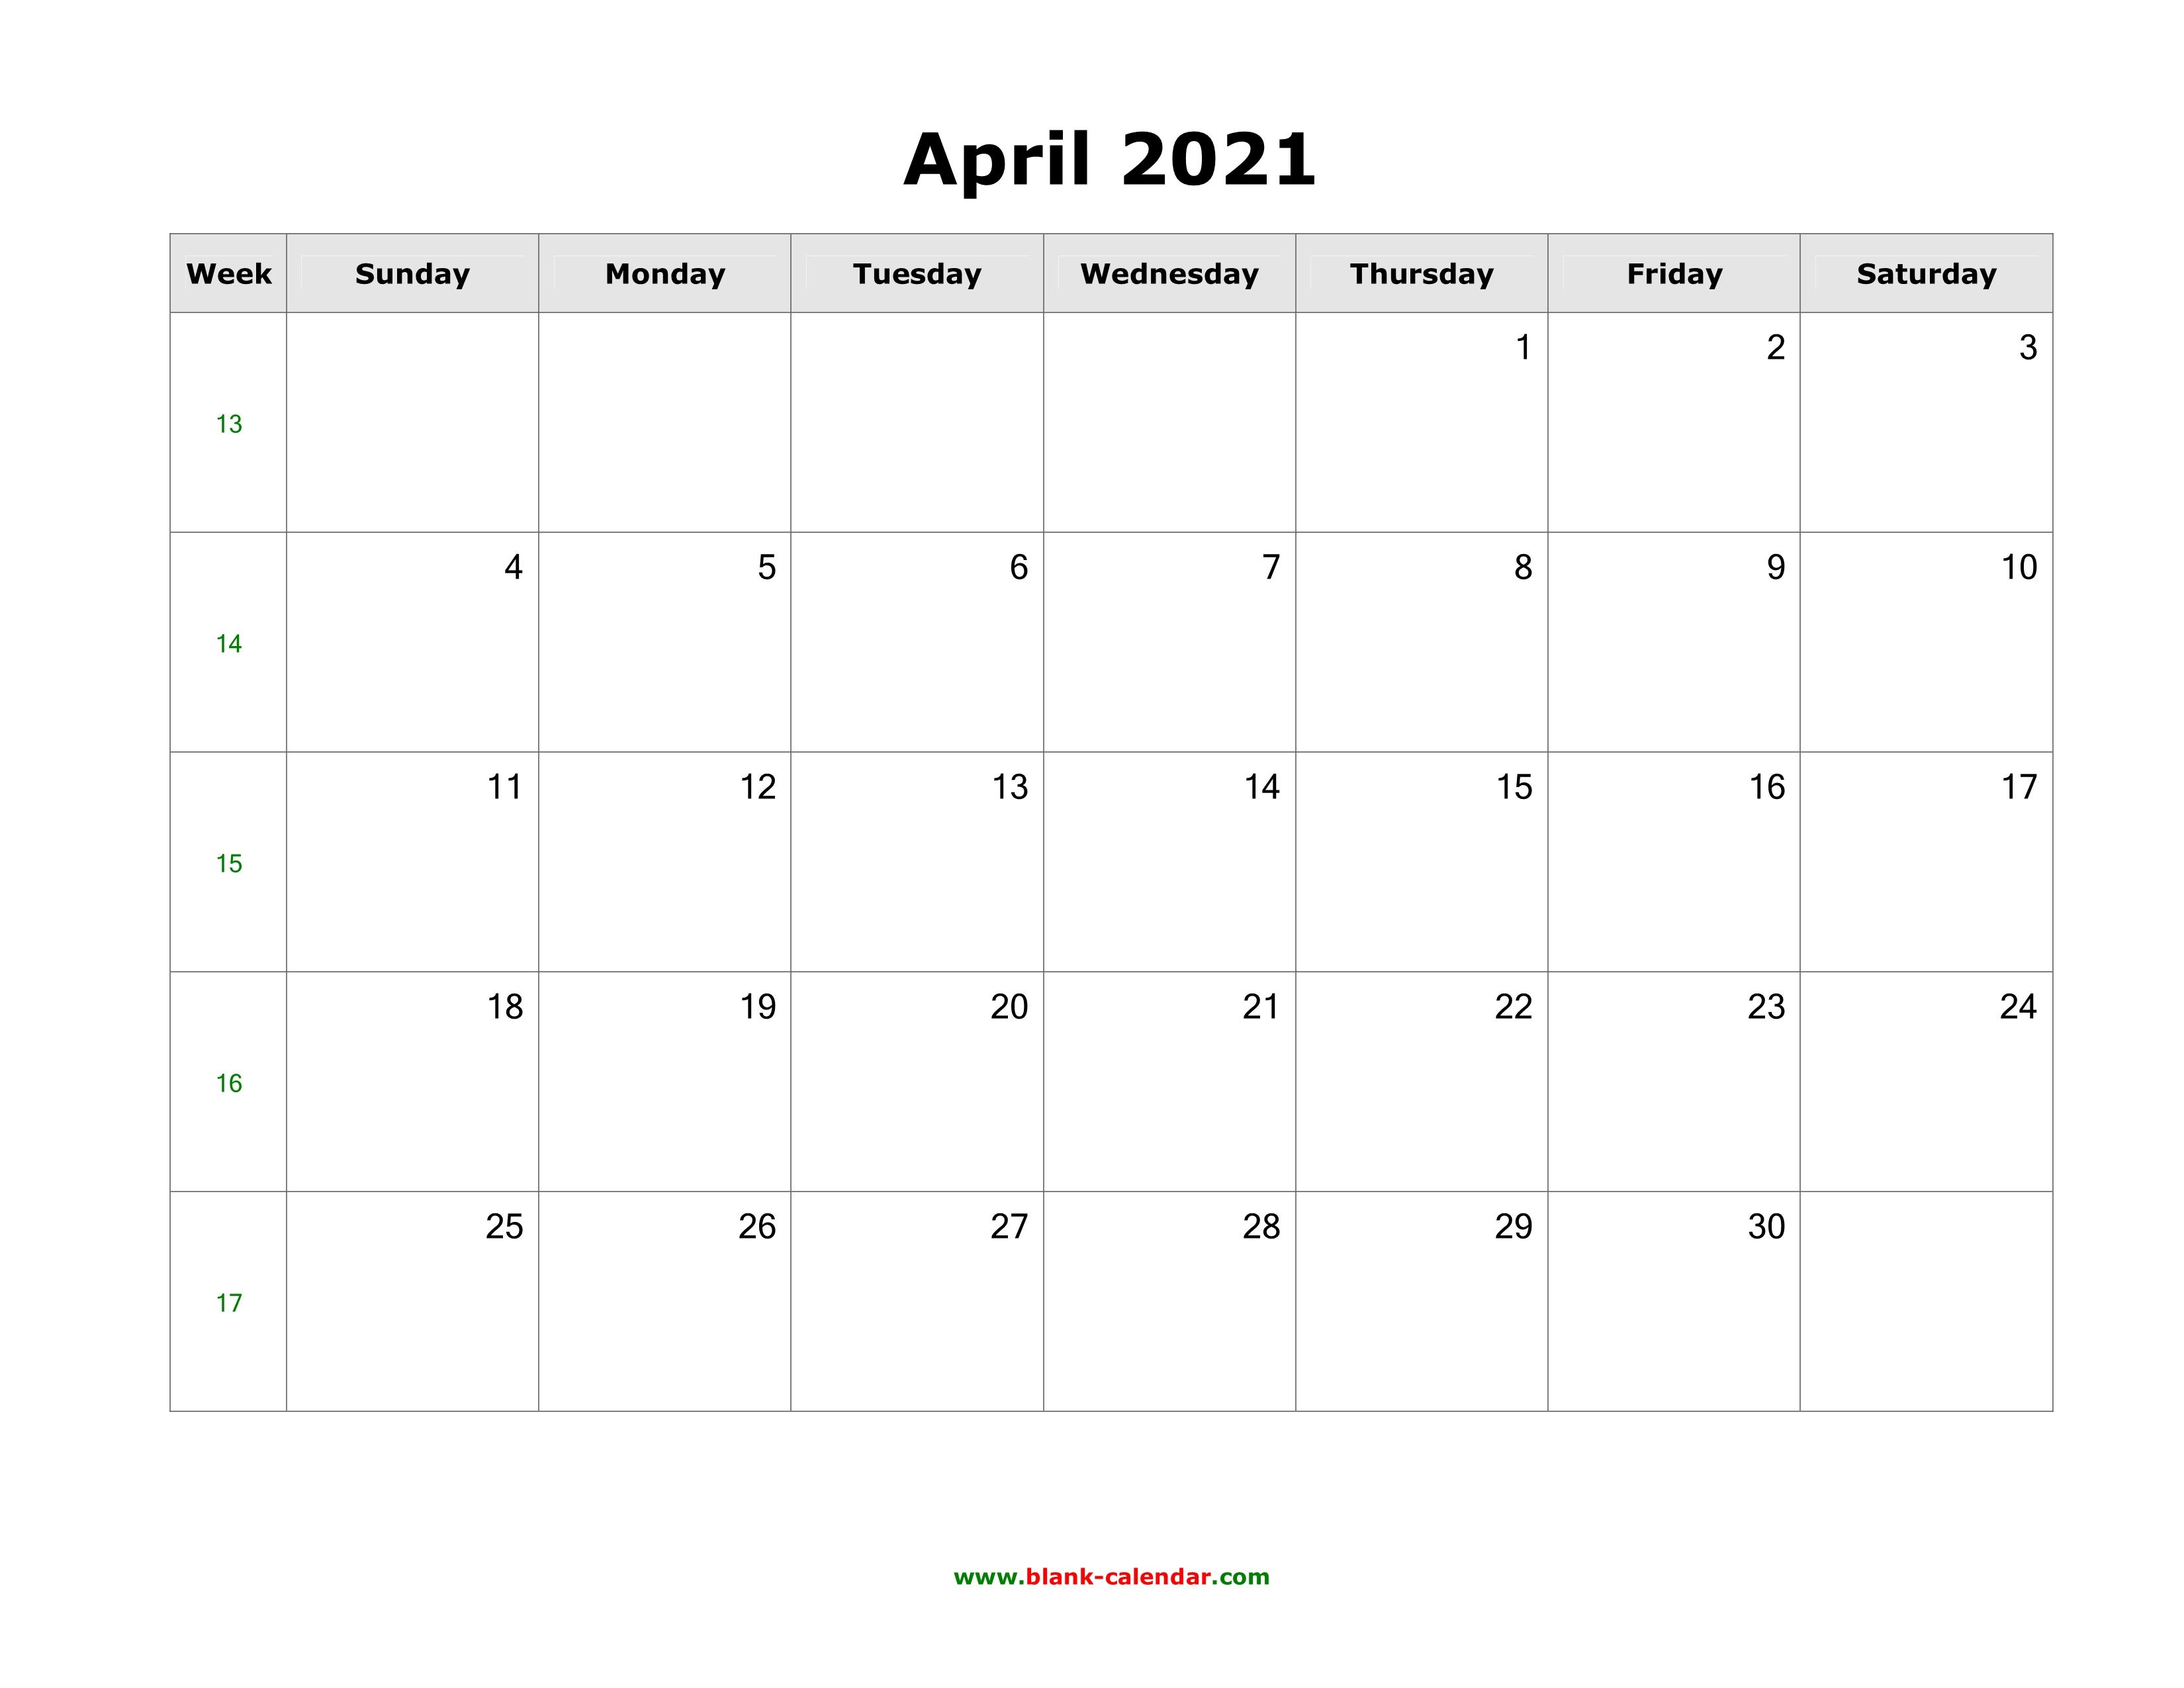 April 2021 Blank Calendar   Free Download Calendar Templates